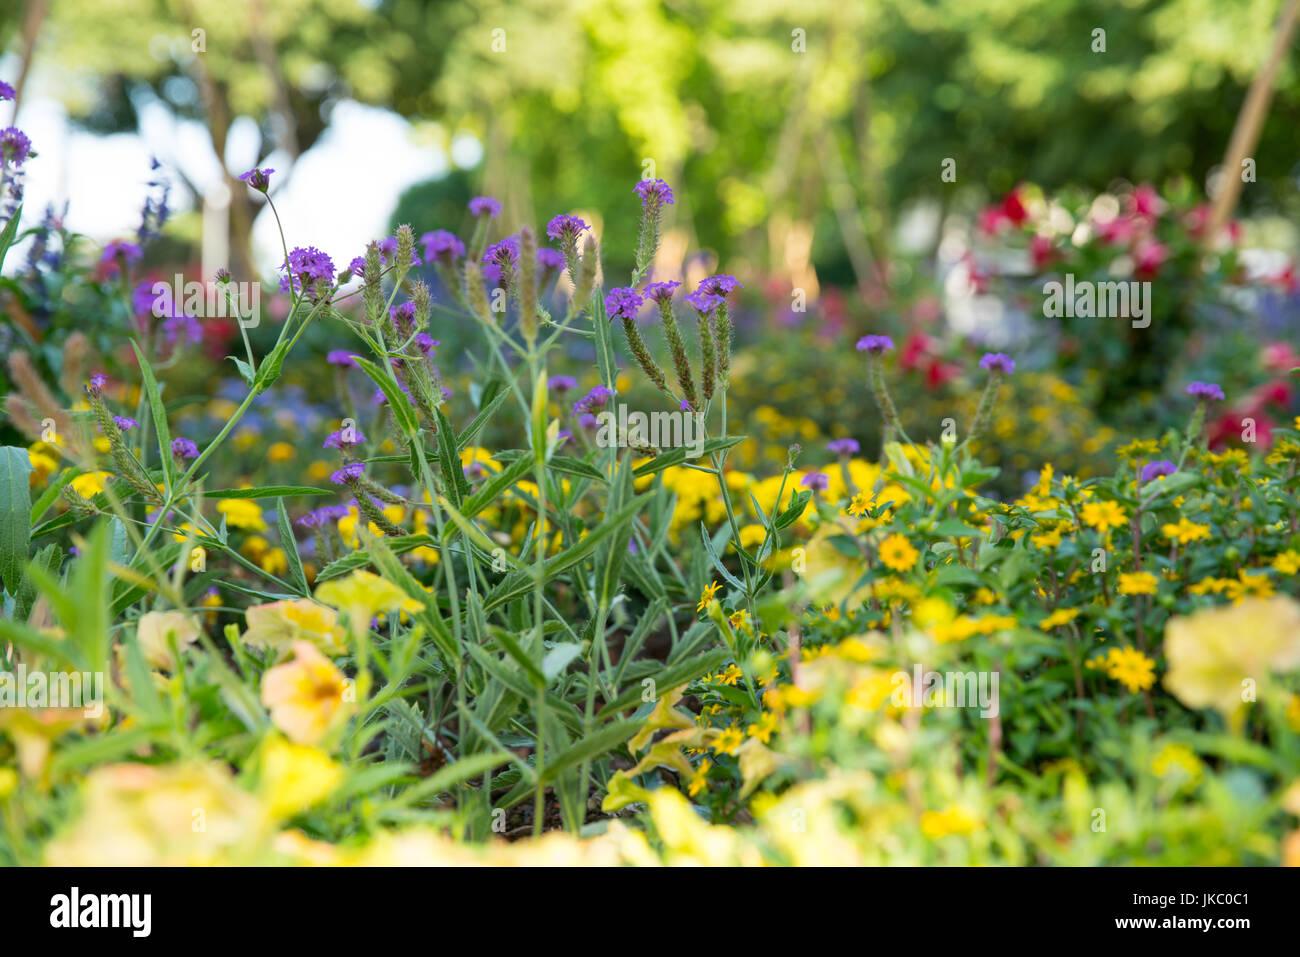 blooming flowers in Volkpark, Mainz ,Germny - Stock Image